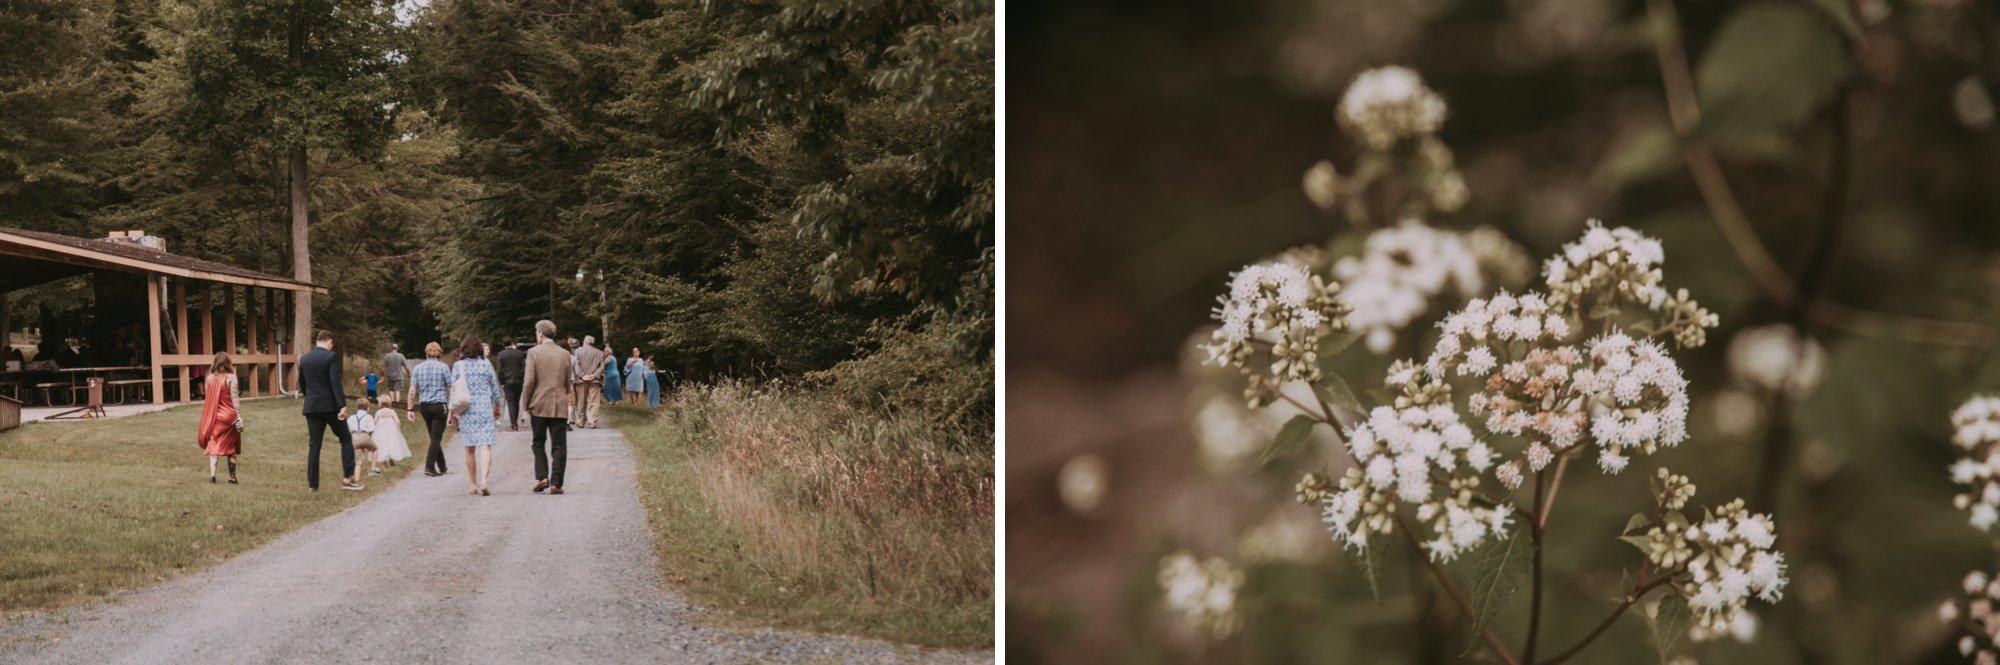 Rustic Intimate Vegan Forest Wedding with Handmade Dress